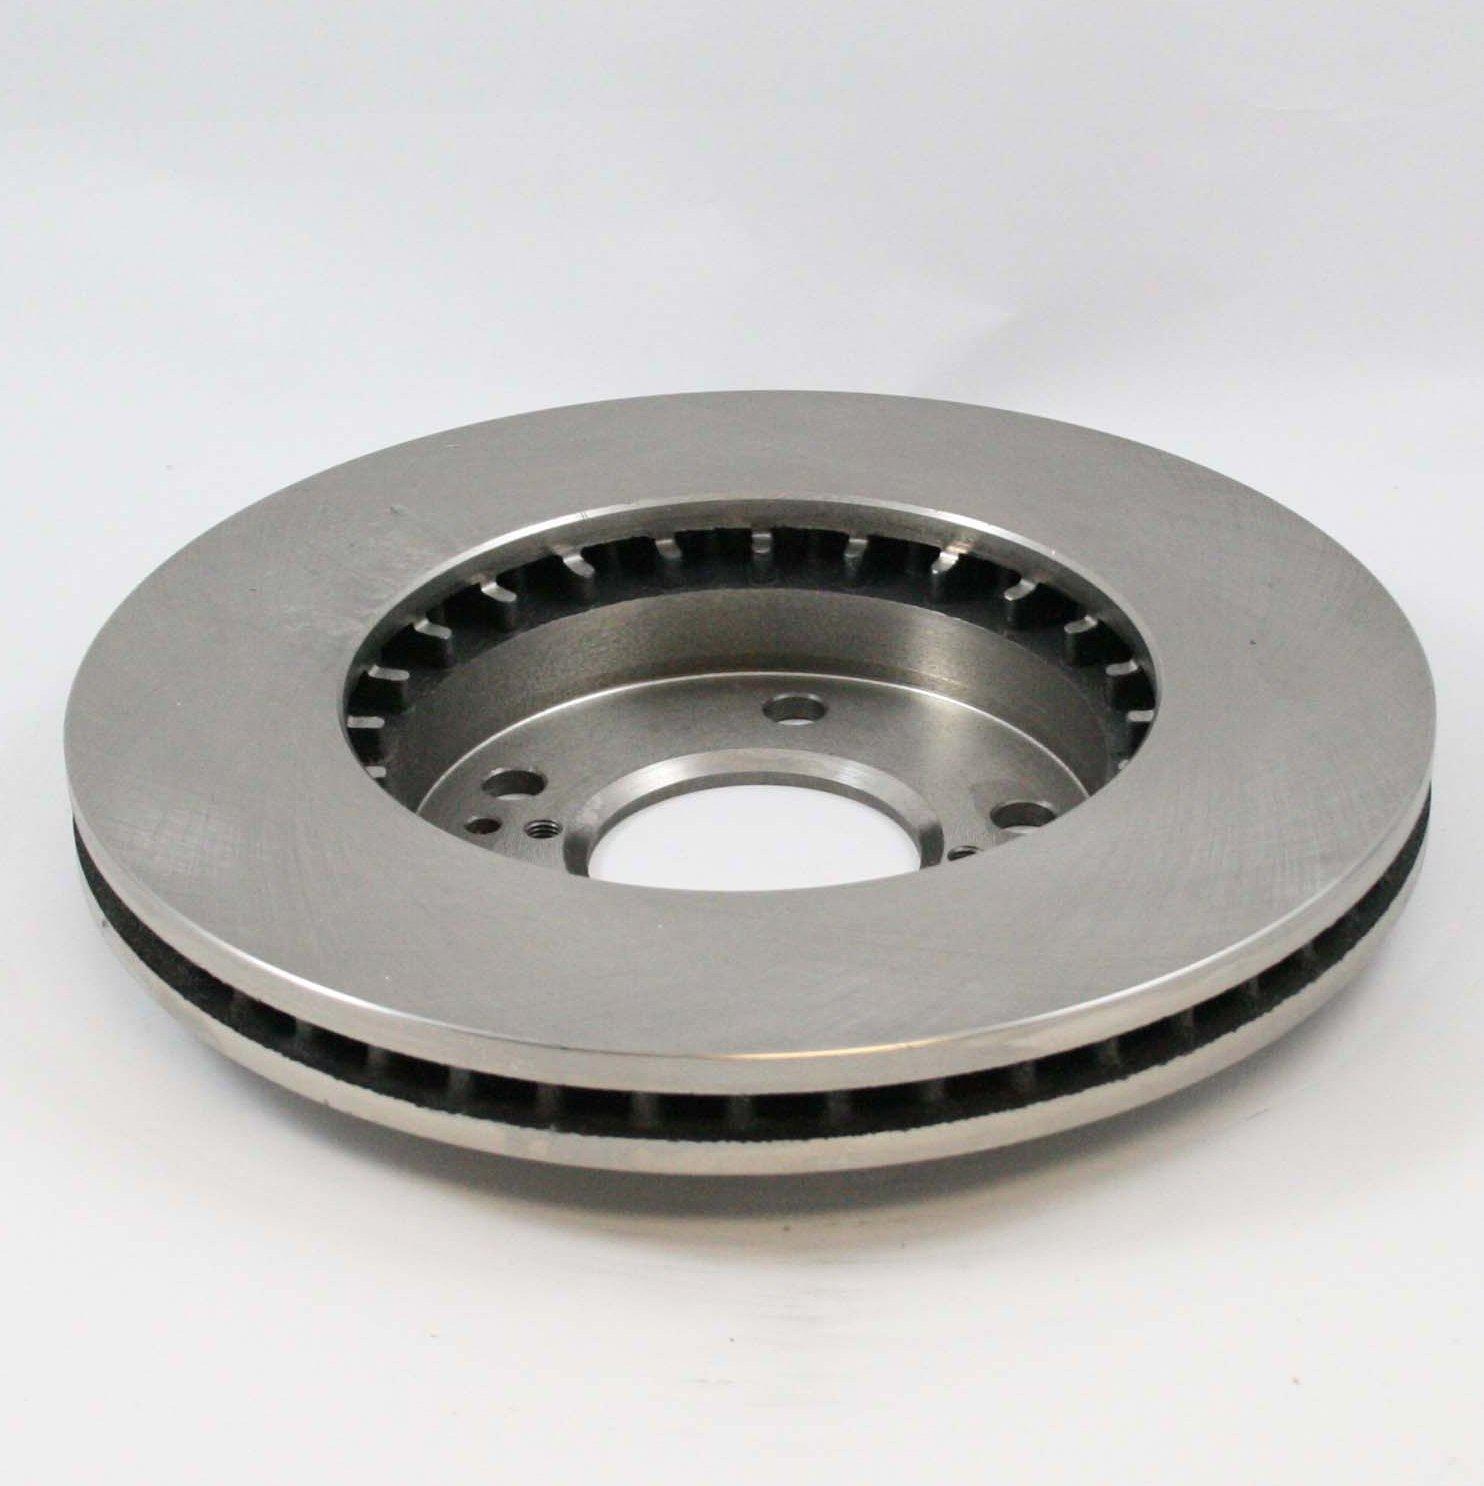 DuraGo BR31338 Front Vented Disc Brake Rotor